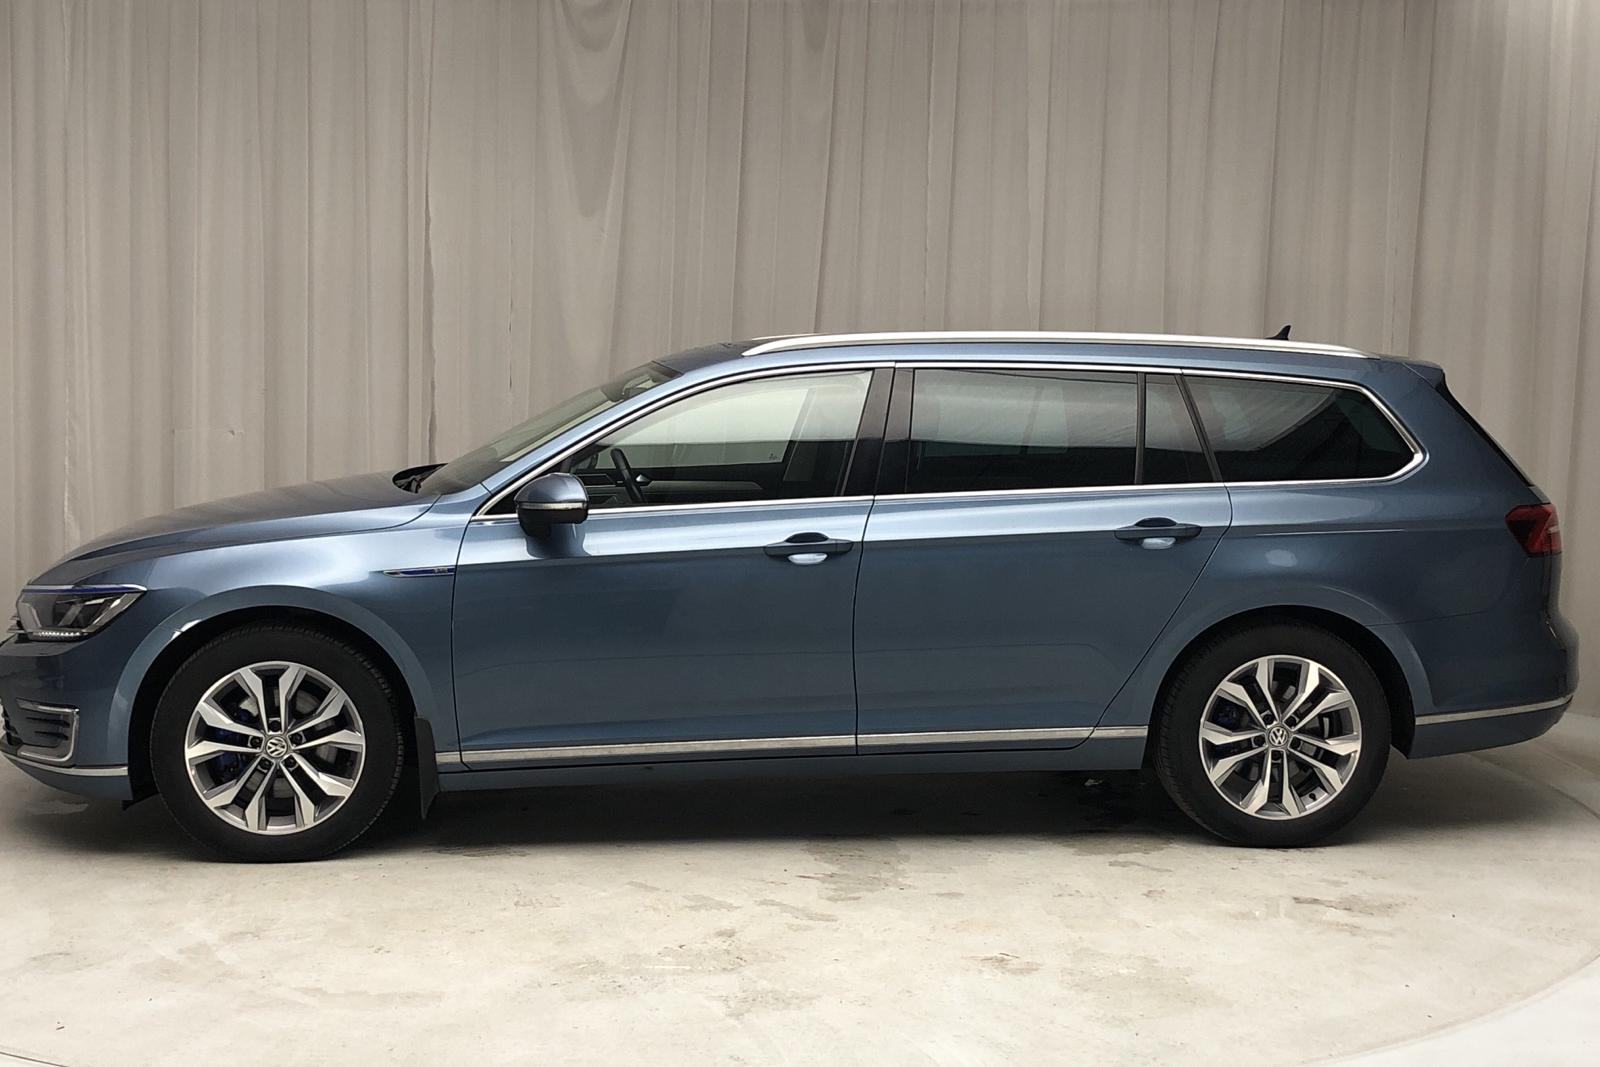 VW Passat 1.4 Plug-in-Hybrid Sportscombi (218hk) - 98 940 km - Automatic - blue - 2017